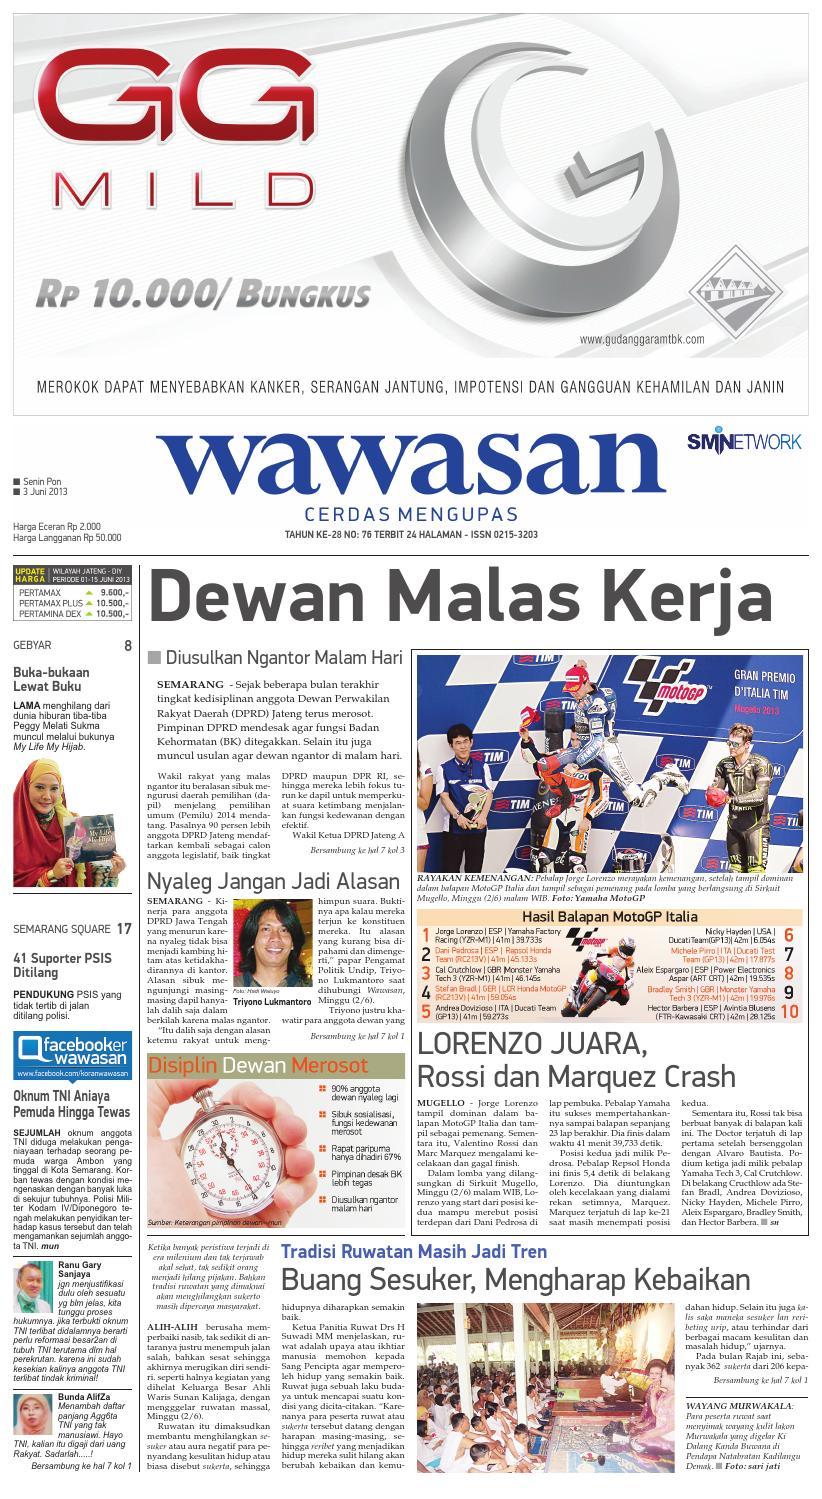 WAWASAN 03 Juni 2013 by KORAN PAGI WAWASAN - issuu c3c81f1b03